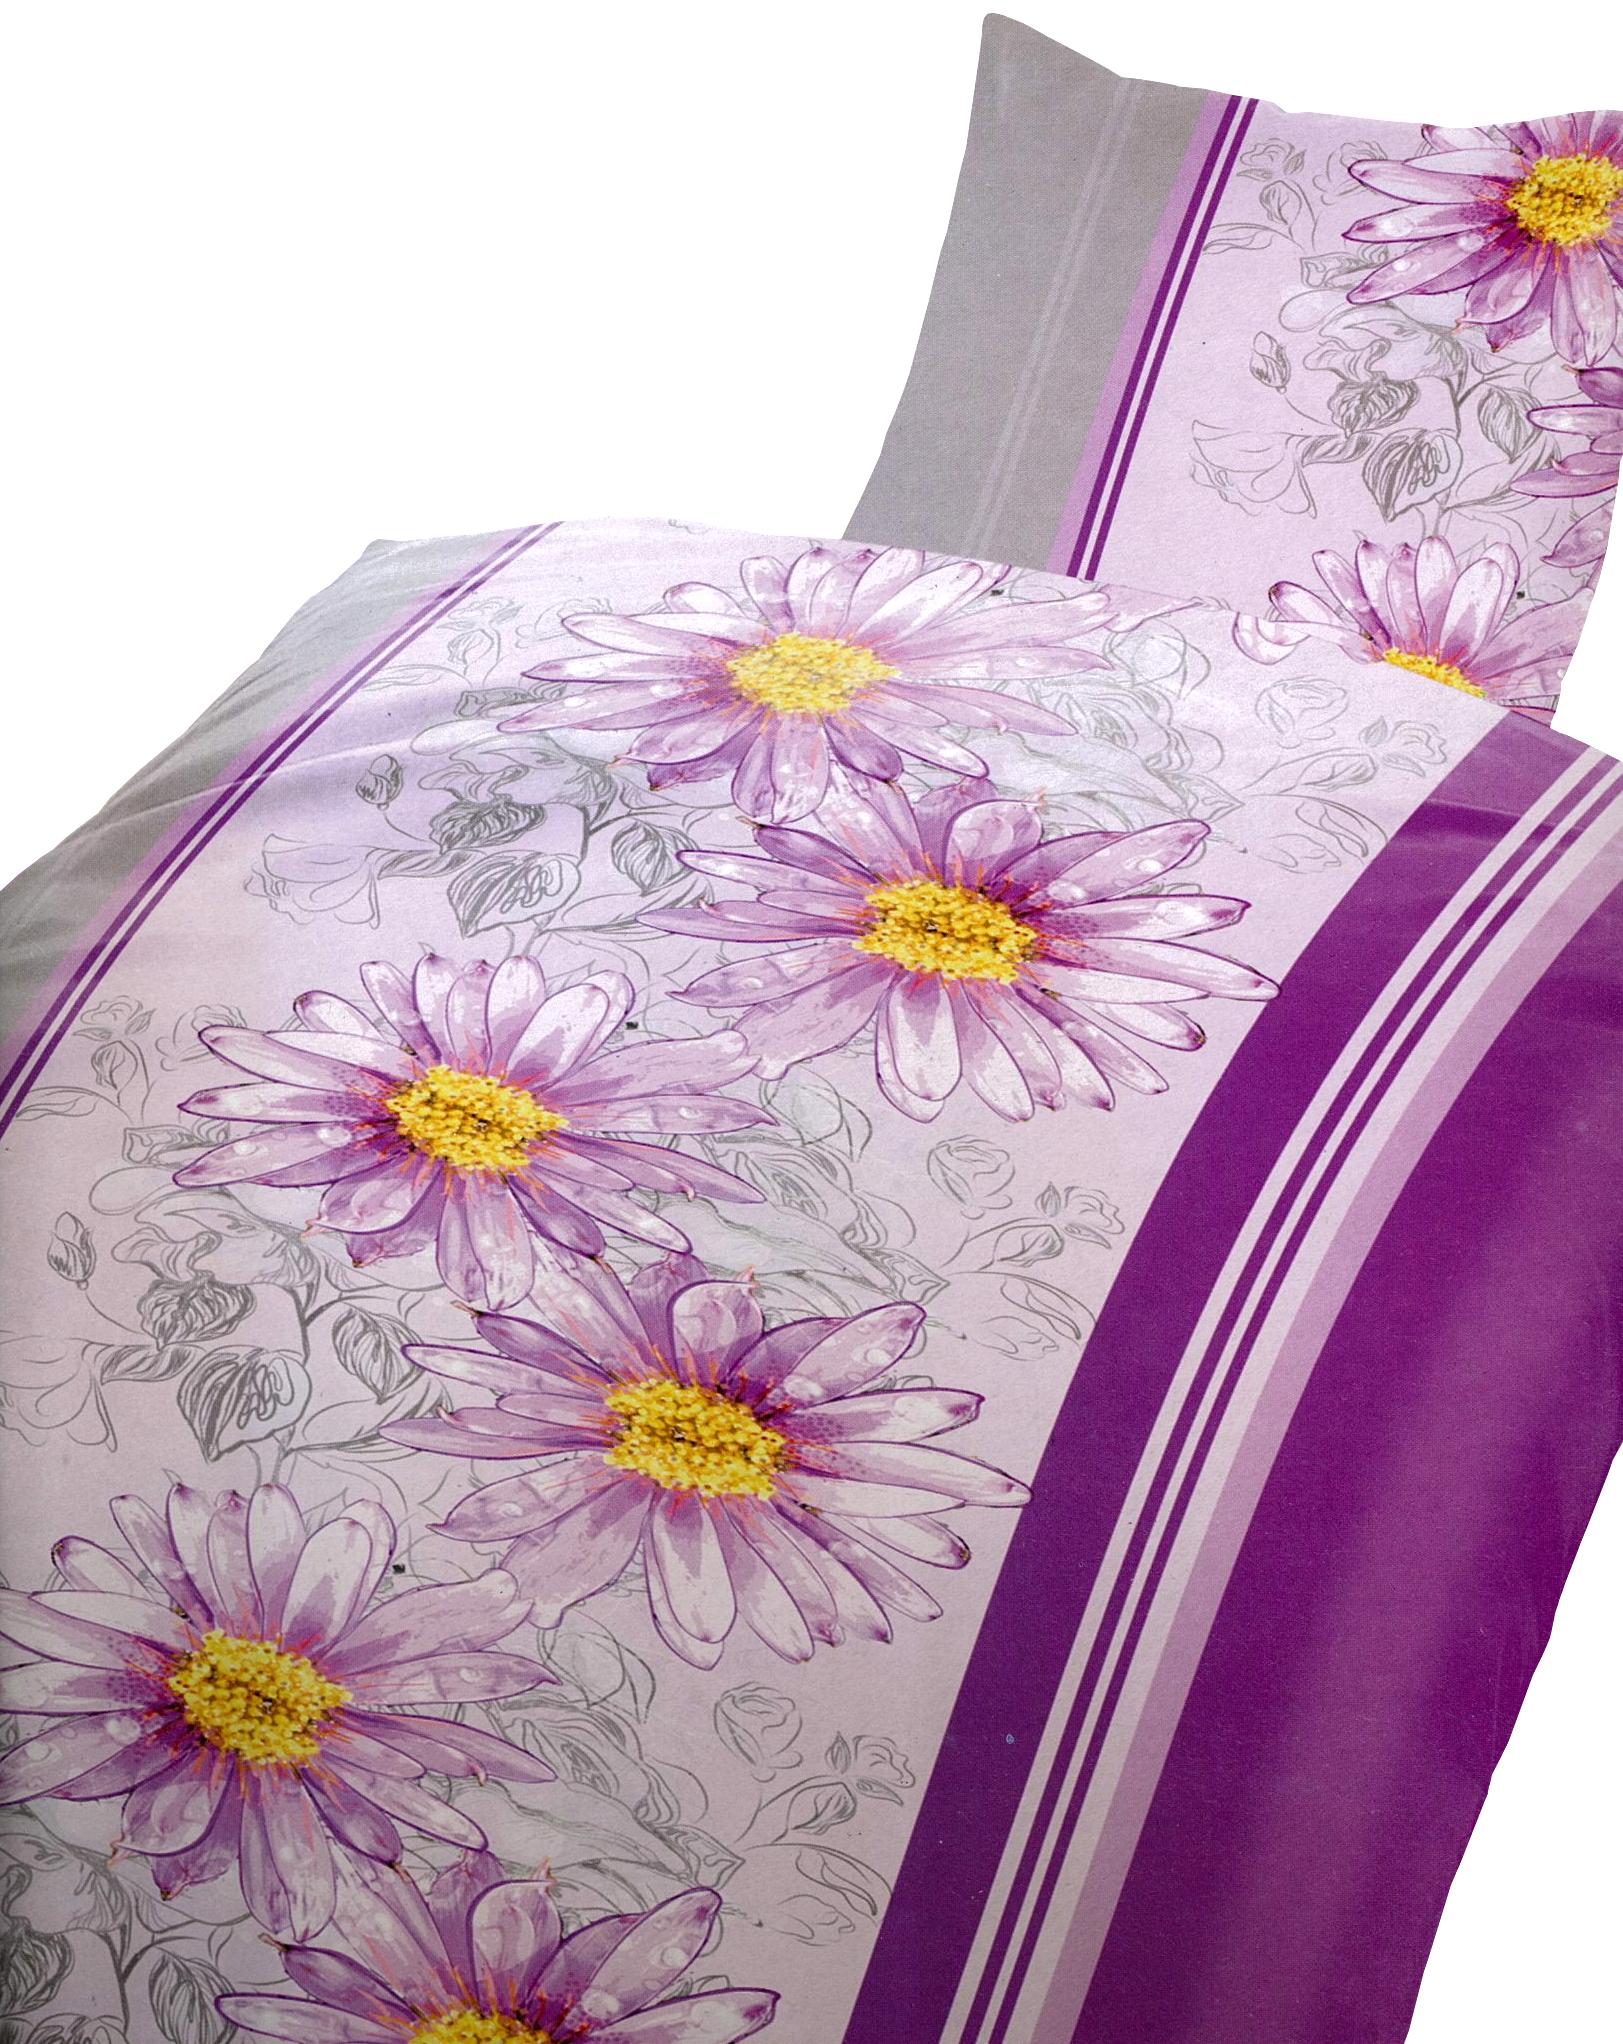 2 tlg bettw sche microfaser 135x200 cm blumen lila rosa gestreift bezug set ebay. Black Bedroom Furniture Sets. Home Design Ideas